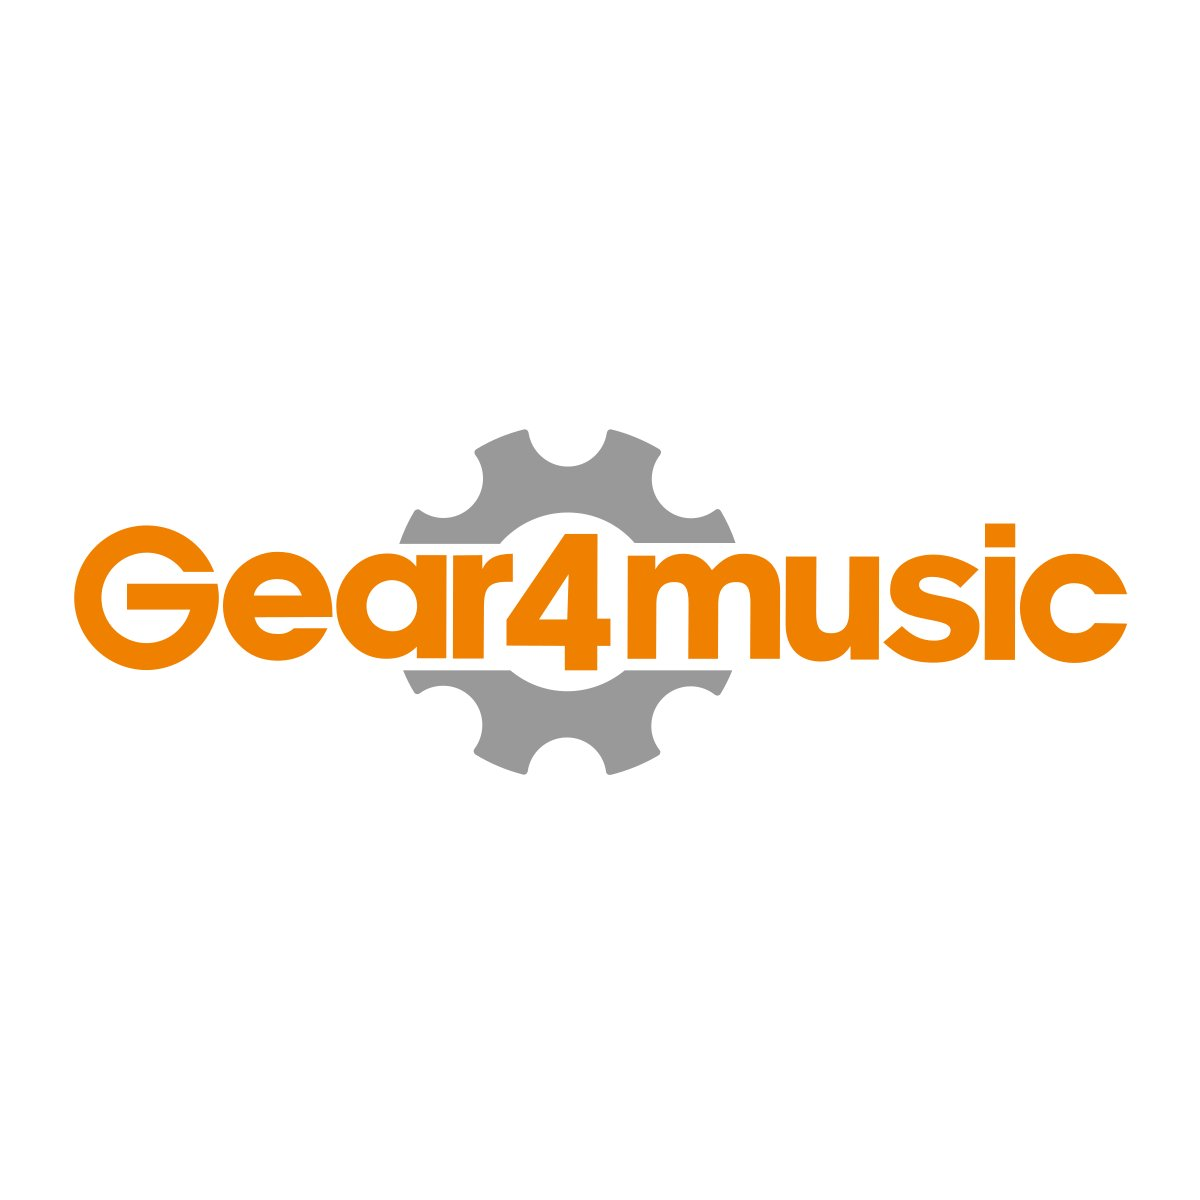 Chitarra elettrica LA per mancini di Gear4music, rosa